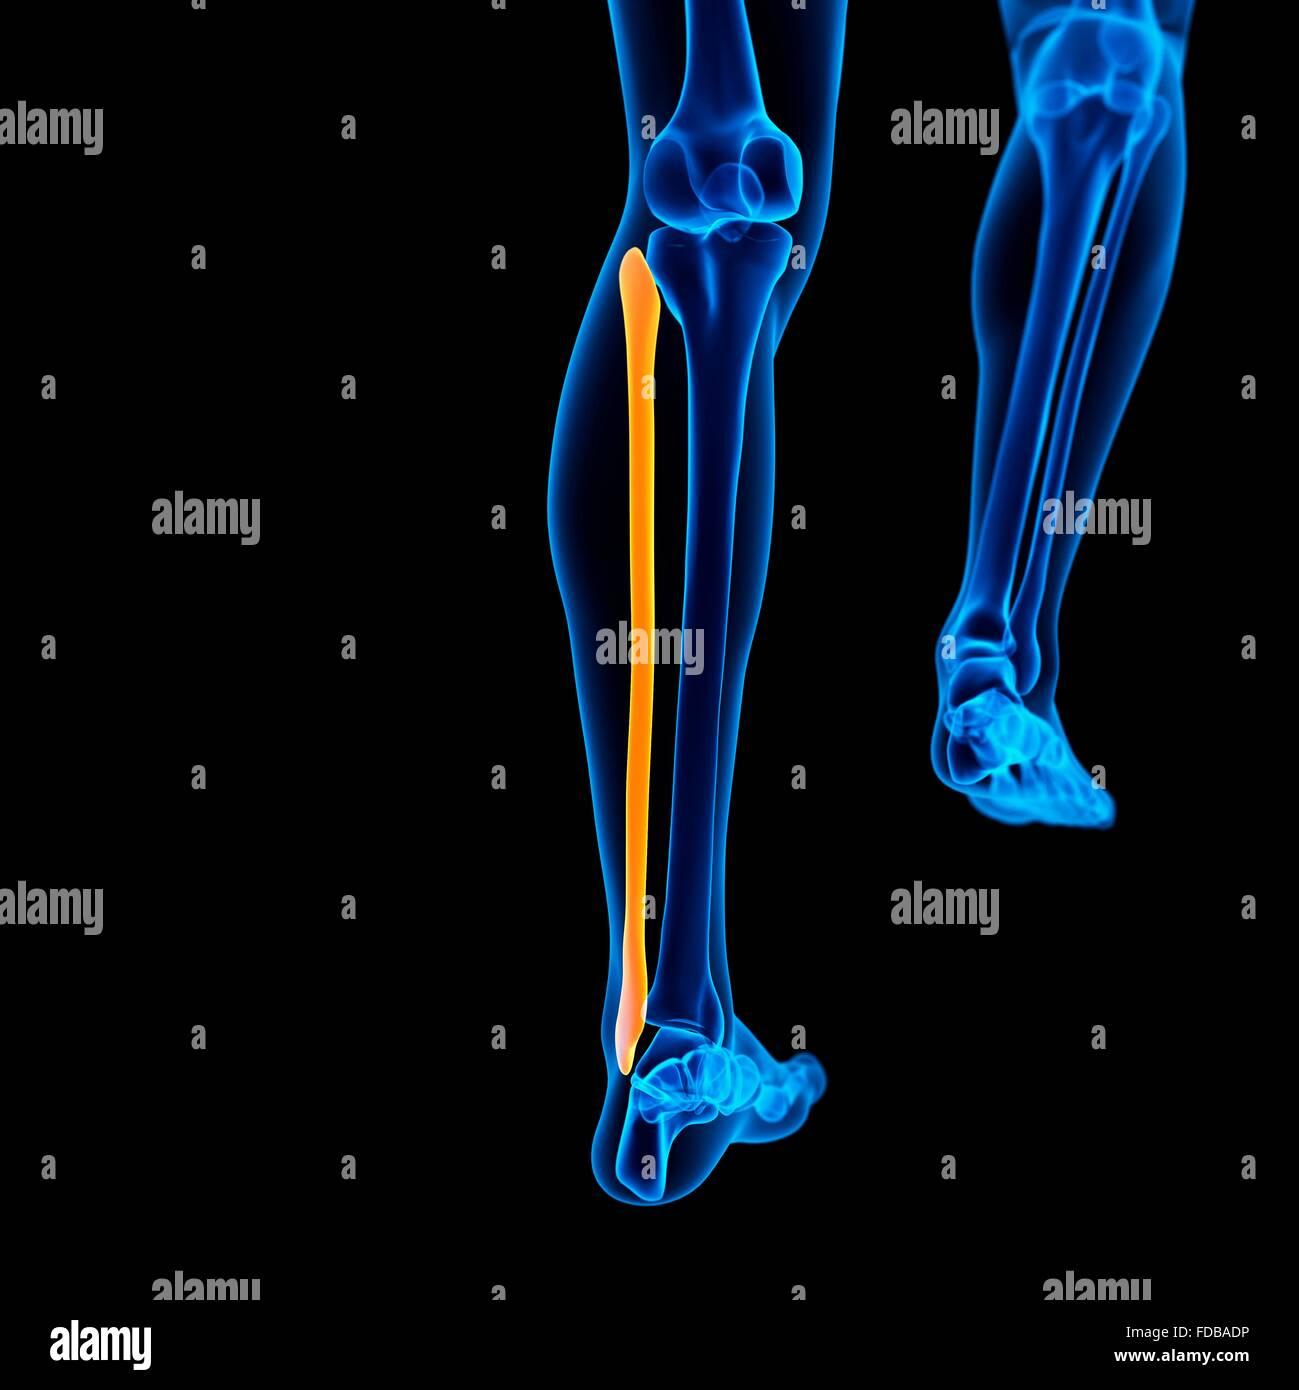 Human fibula bone